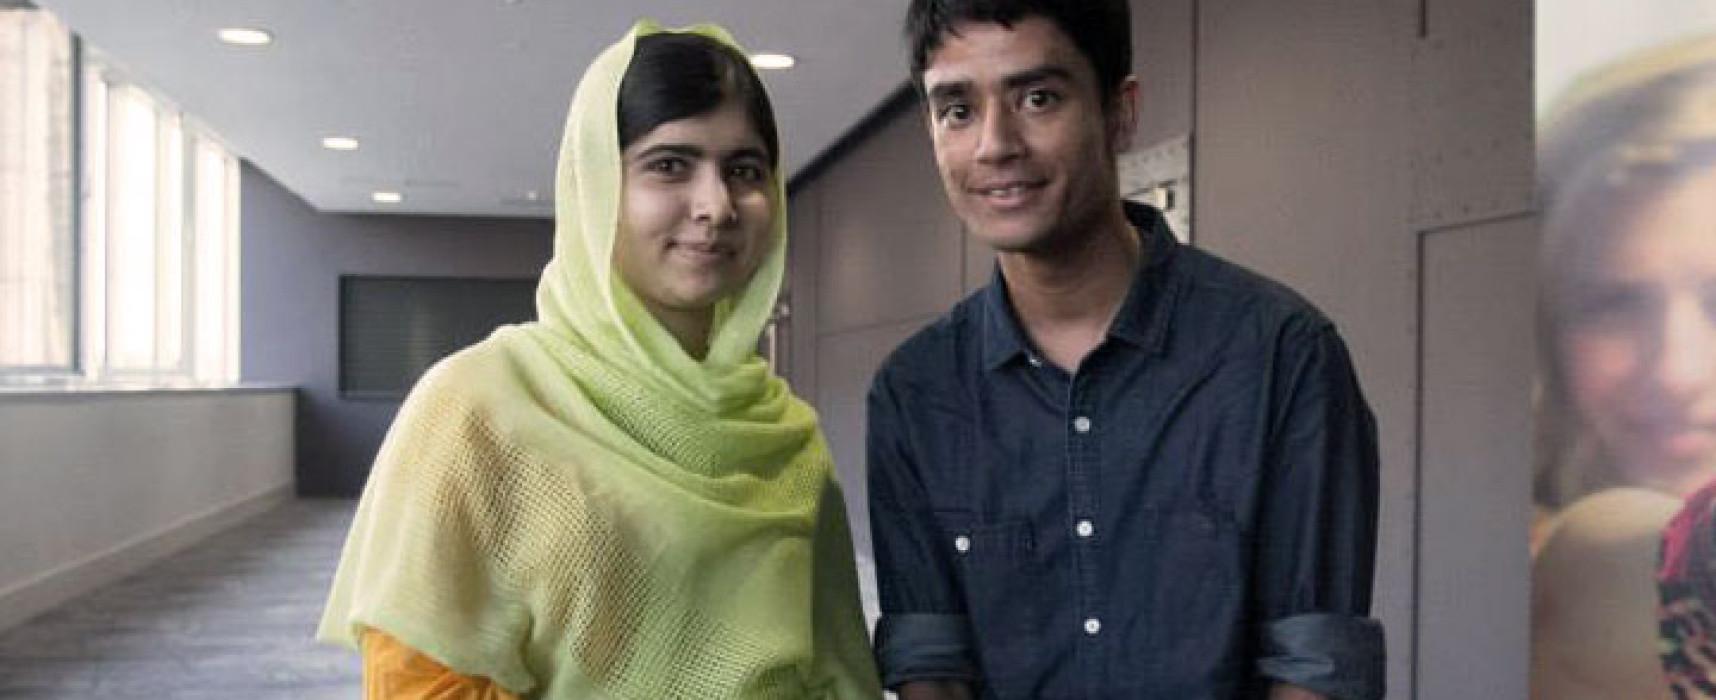 Meeting Malala: An Experience I Will Cherish Forever